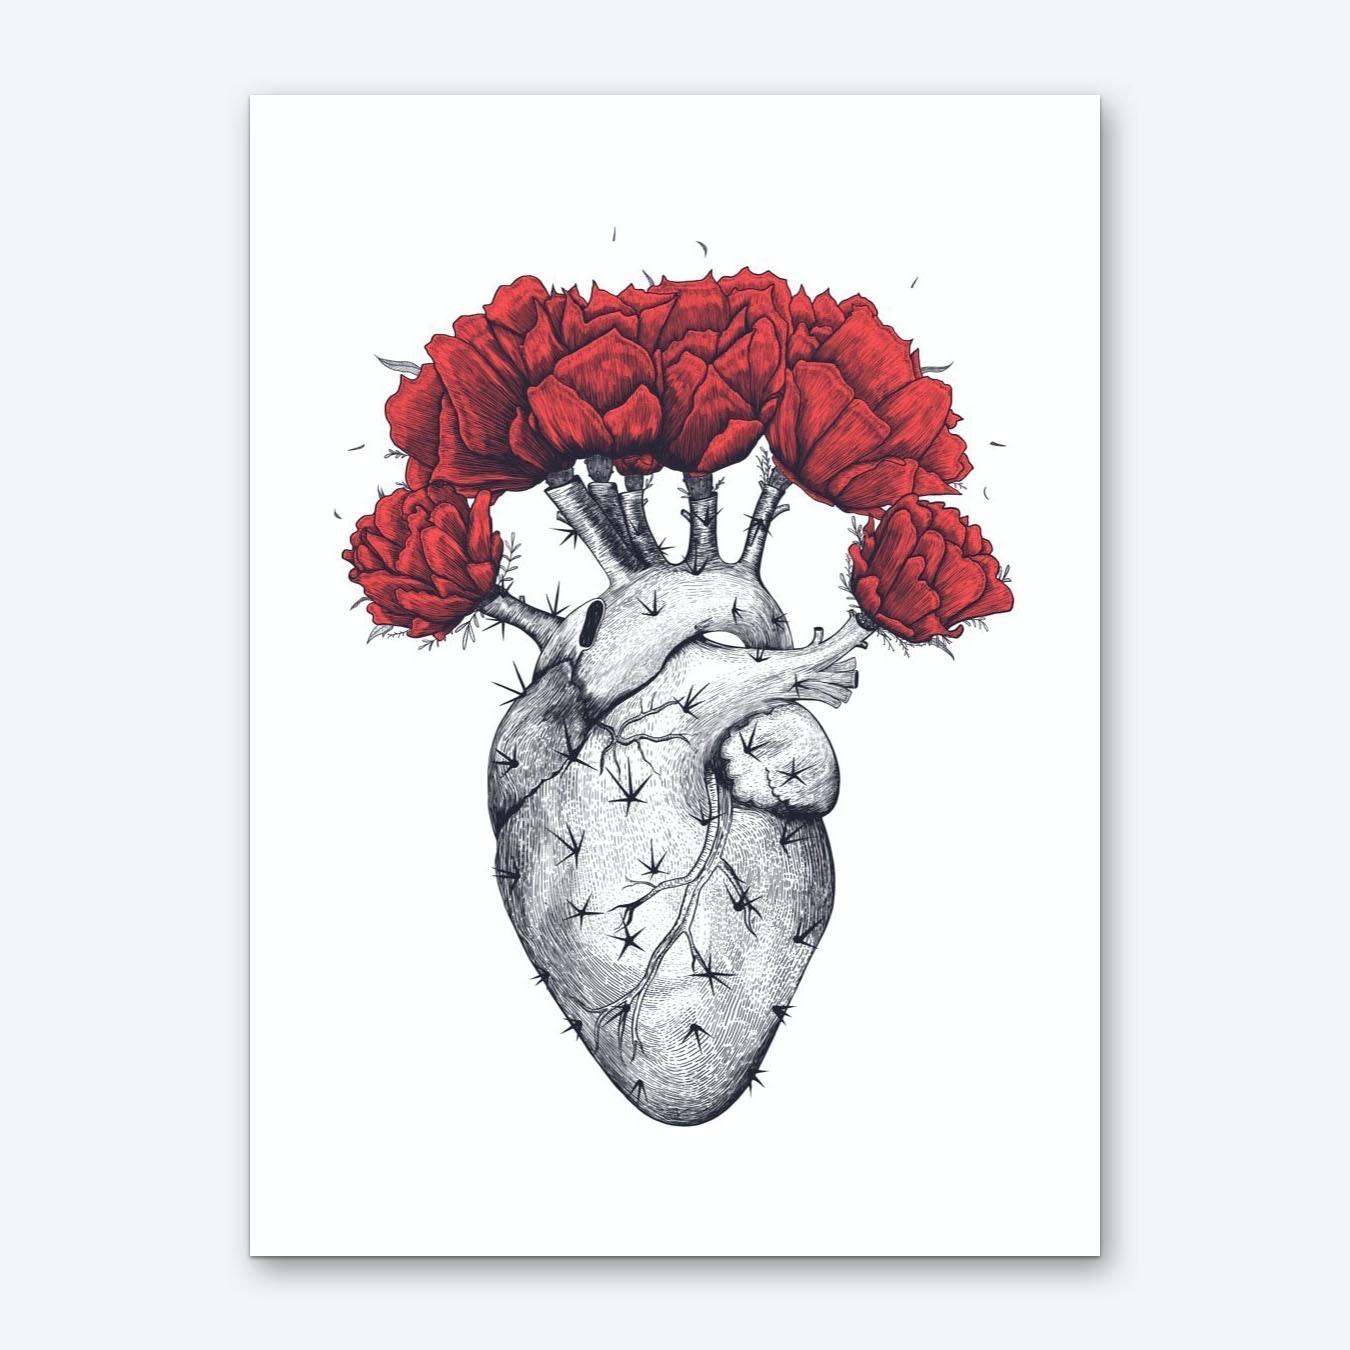 Cactus Heart Art Print By Valeriya Korenkova - Fy